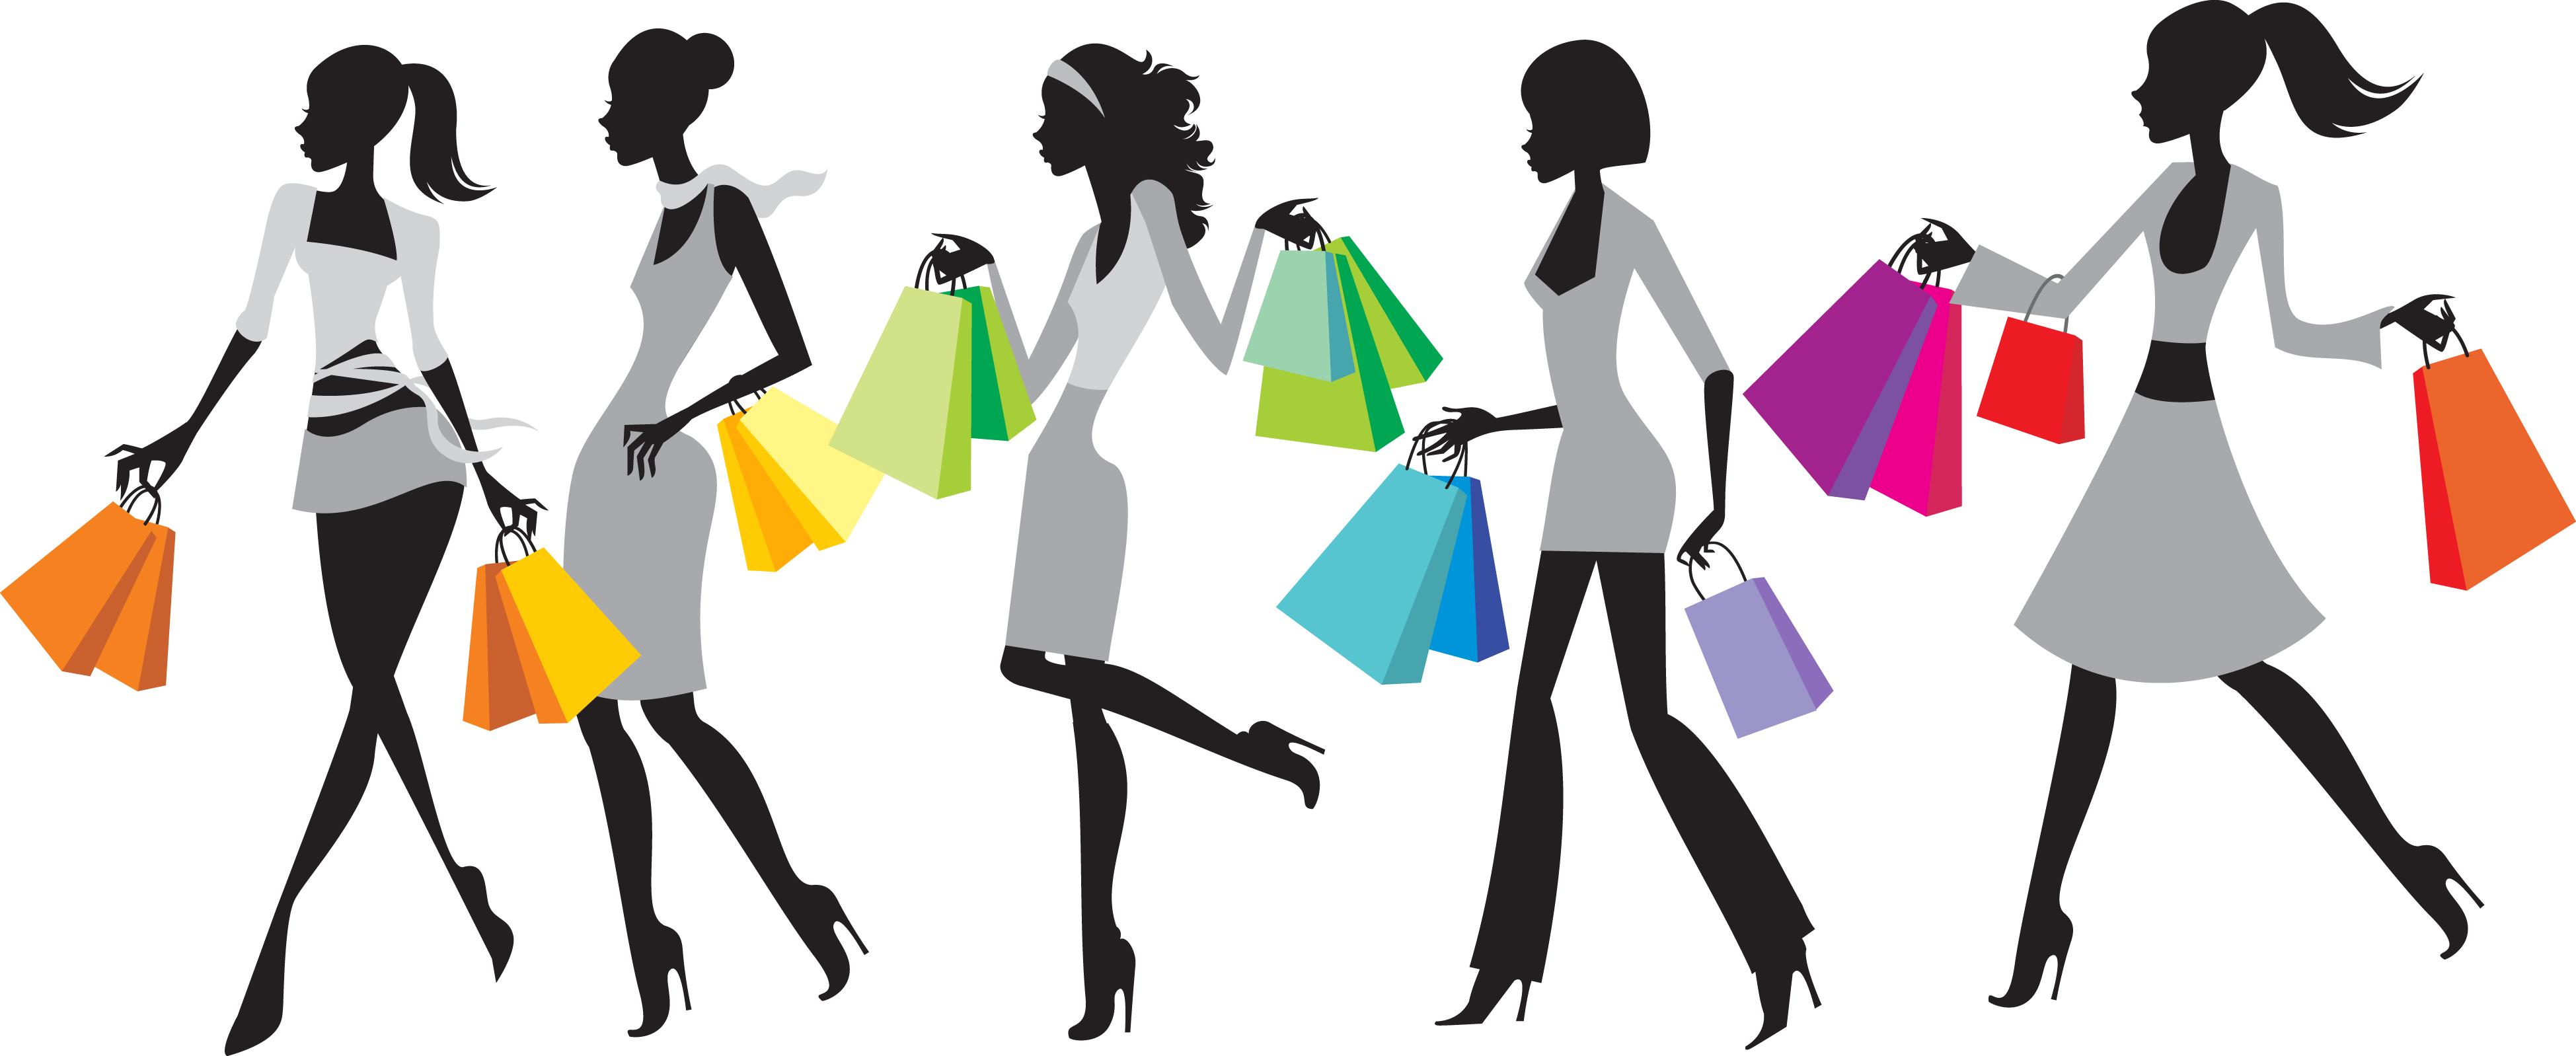 free-vector-fashion-shopping-01-vector_000527_fashion_shopping_01_vector.jpg